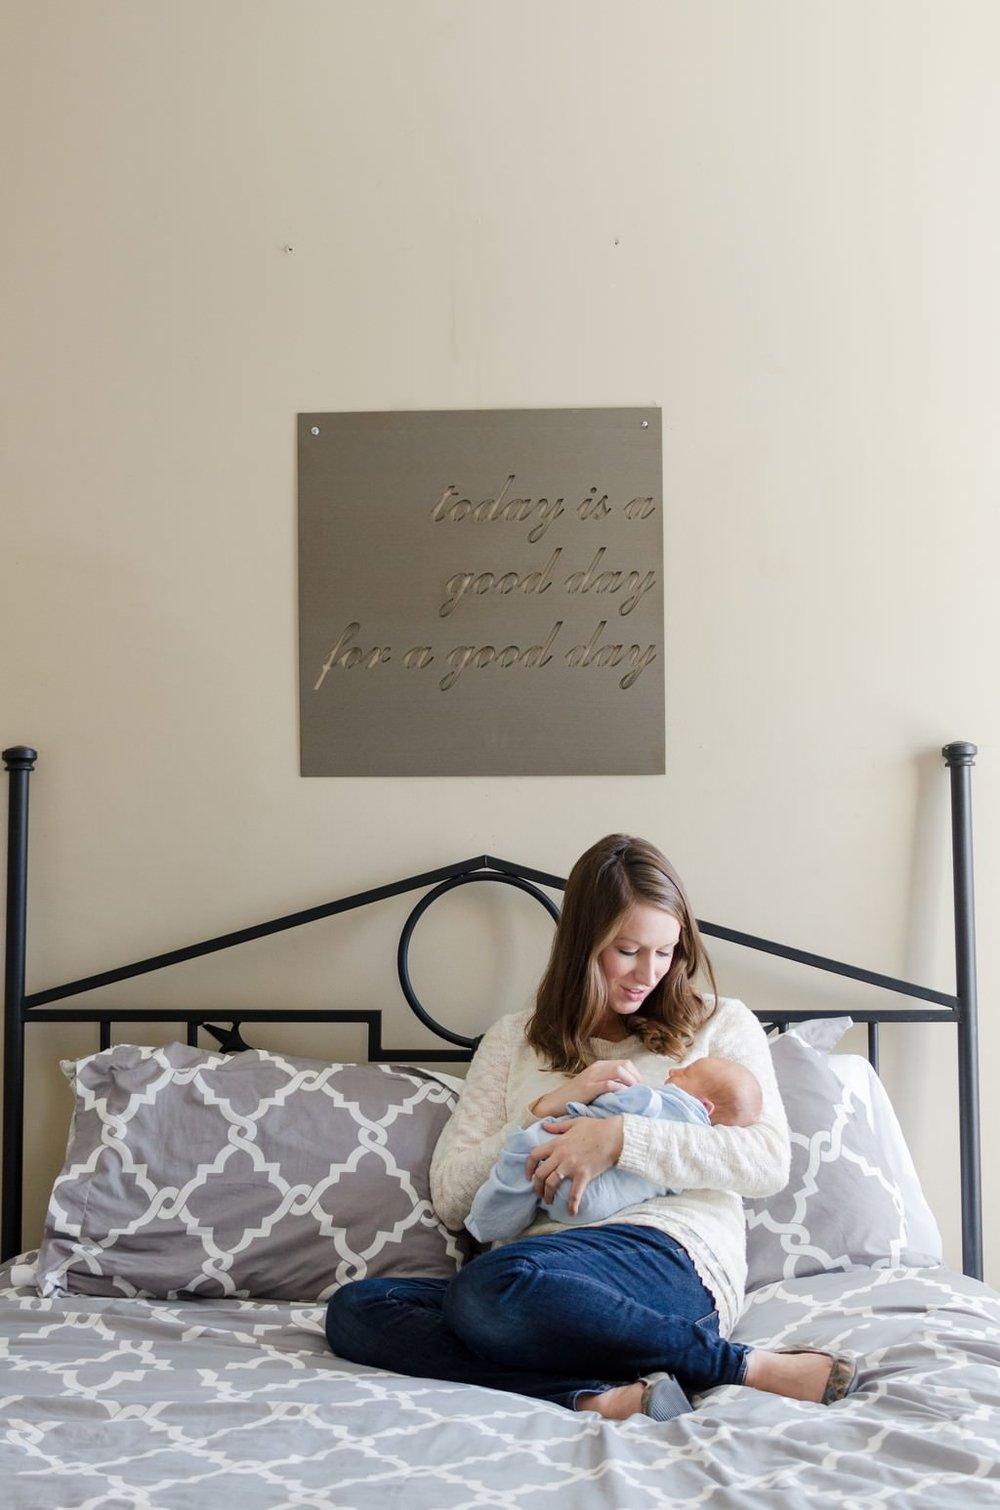 Noah-In-Home-Lifestyle-Newborn-Session-Murfreesboro-Nashville-Photographers+3